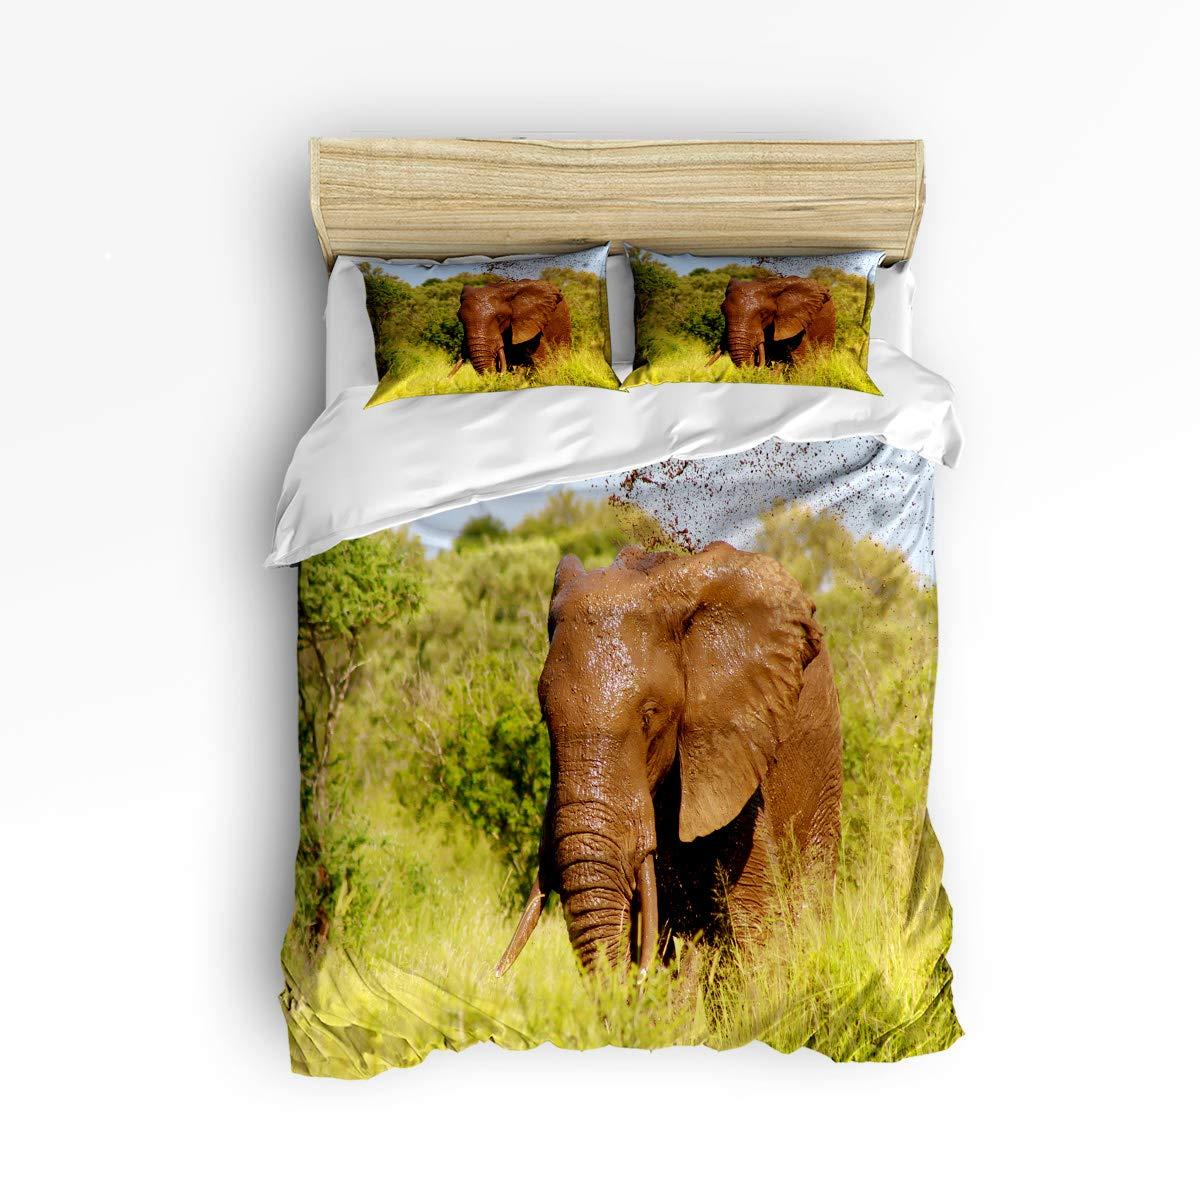 EZON-CH かわいい布団カバー3点セット 子供 男の子 女の子 美しい太陽の下のイルカの風景 高級寝具セット 枕カバー2枚付き King Size 20190117WHLSJSEZONCSLEO01340SJSDEZN B07MVWTRPD Elephant27ezn3138 King Size